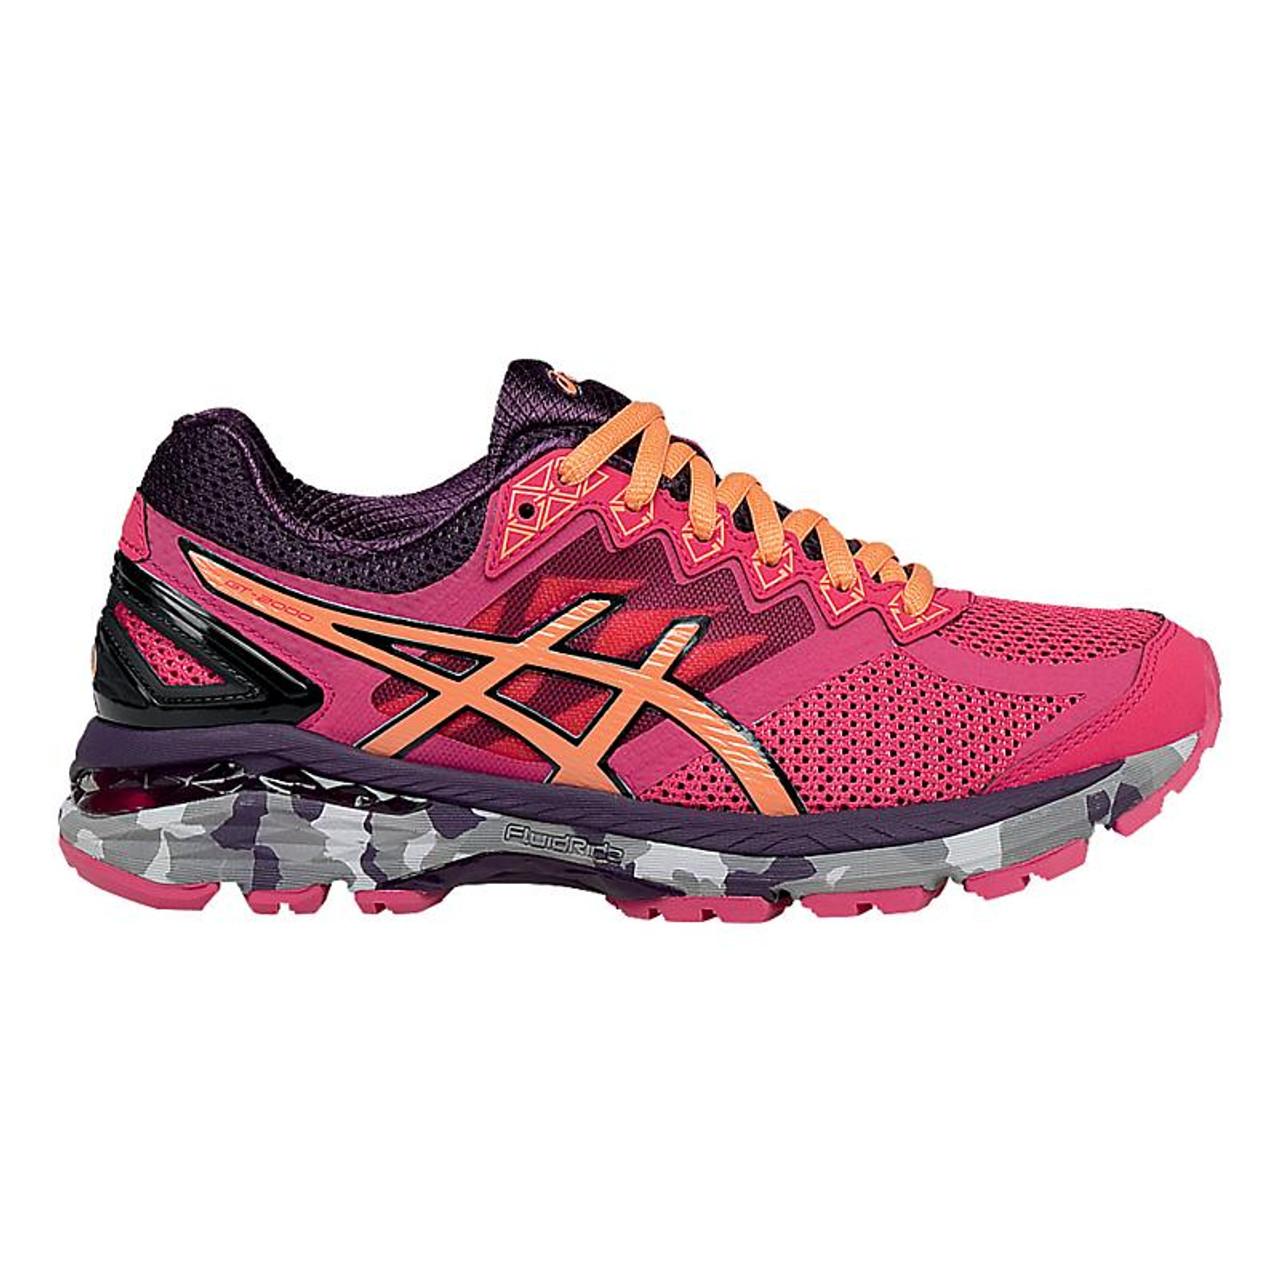 Asics GT 2000 4 Trail Running Shoe Womens